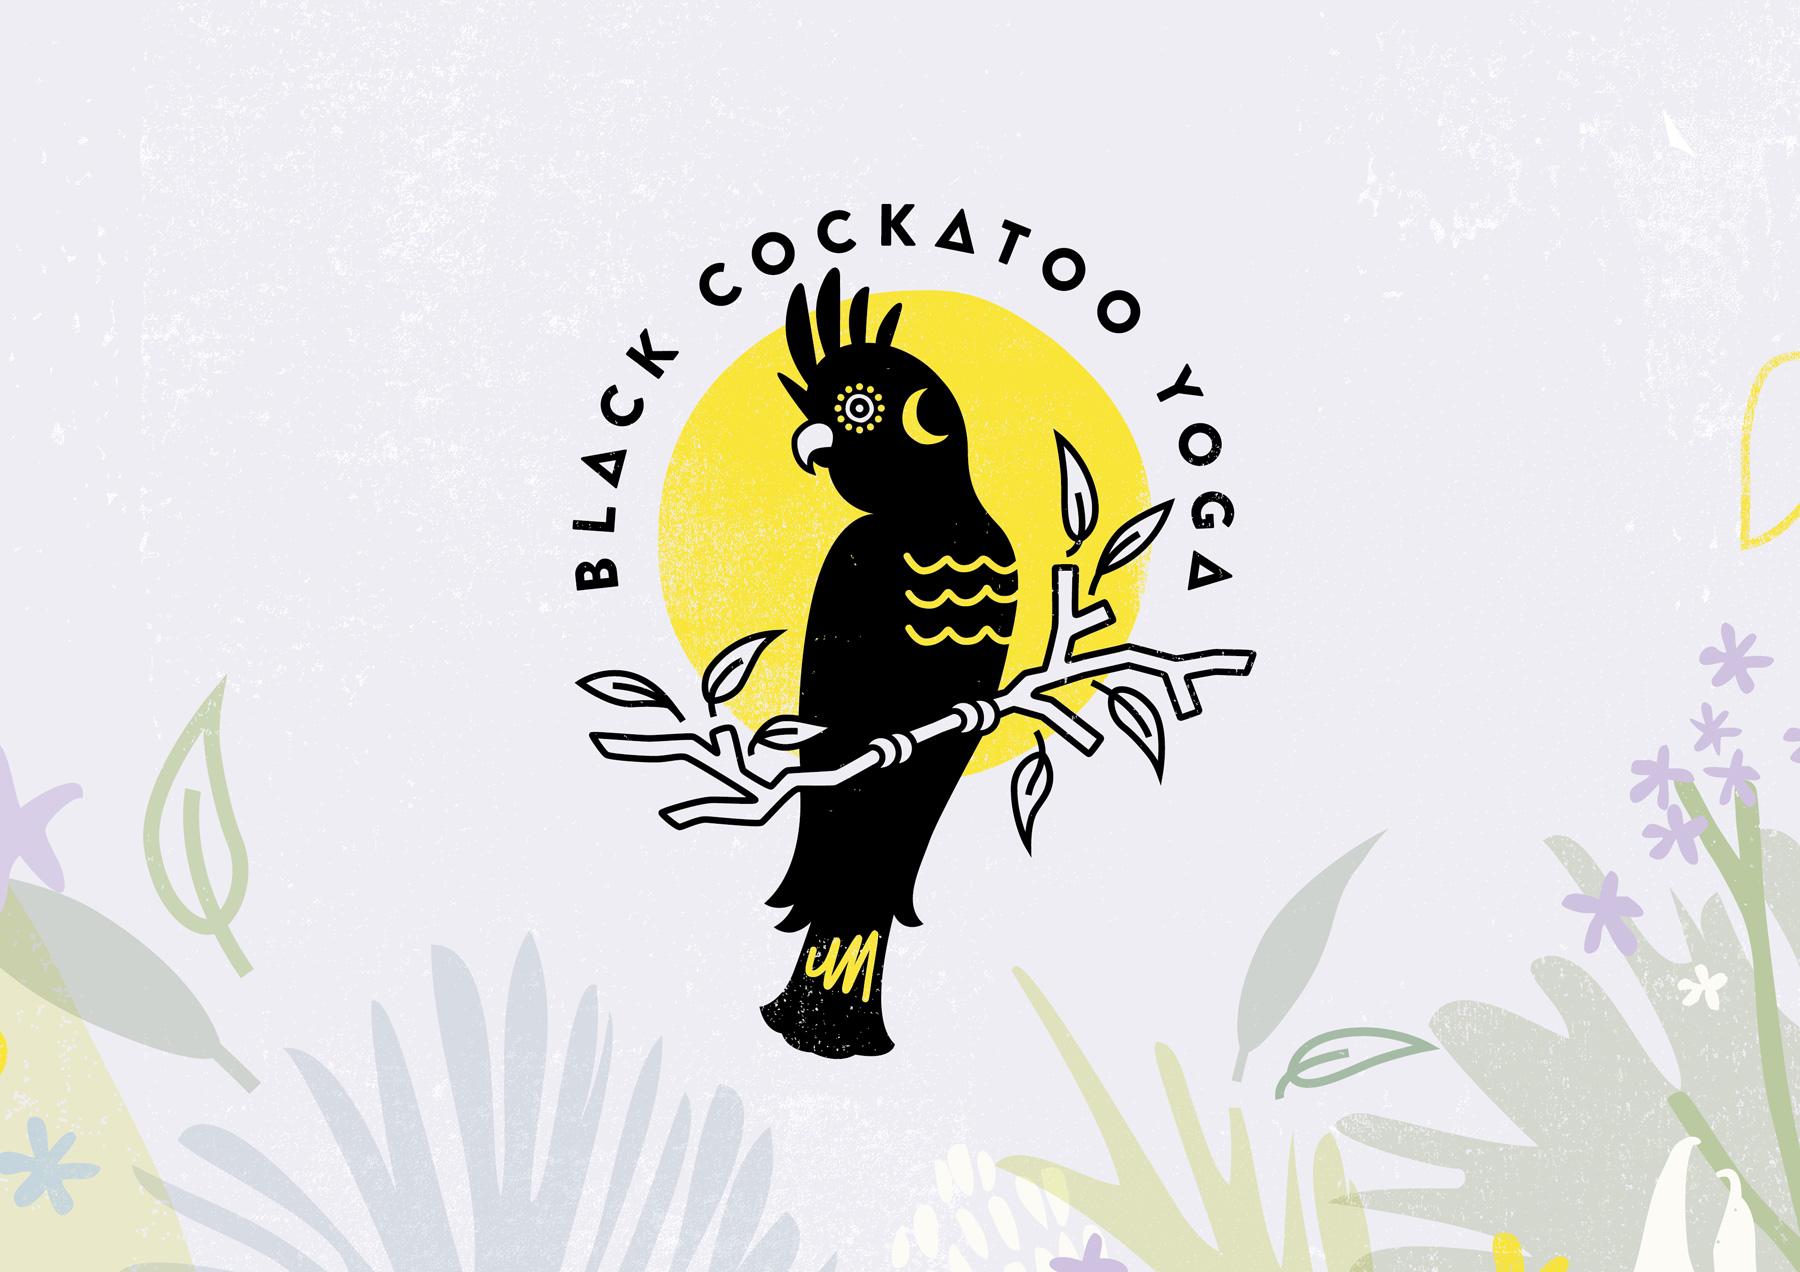 Black Cockatoo Yoga